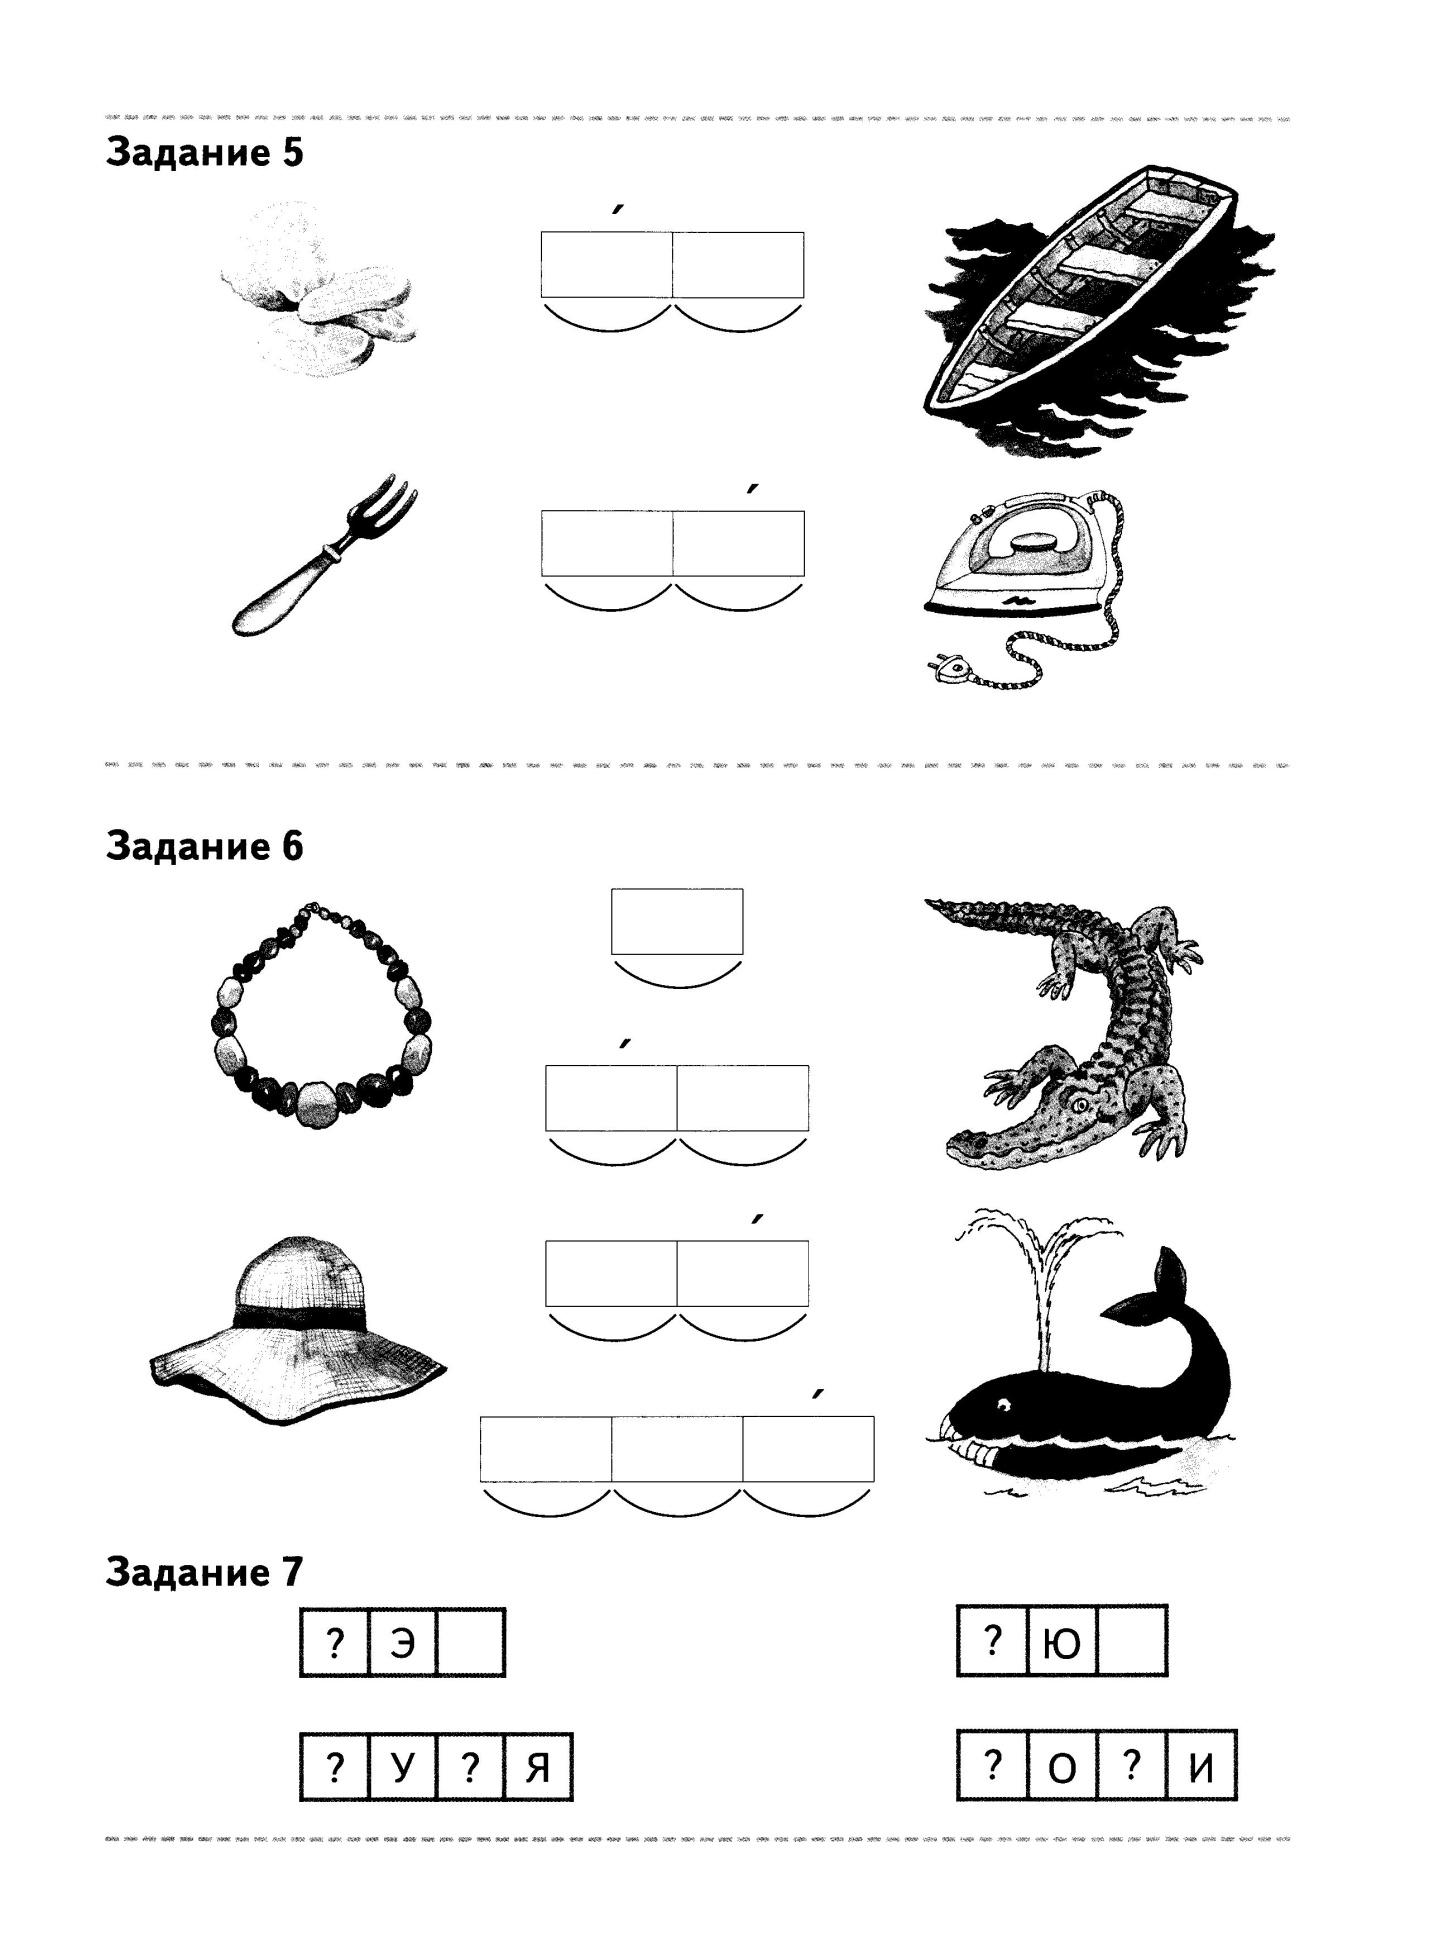 C:\Documents and Settings\User\Мои документы\Мои рисунки\2014-12-15\Диагностическая работа по математике, 2 класс, Виноградова Н. 003.jpg